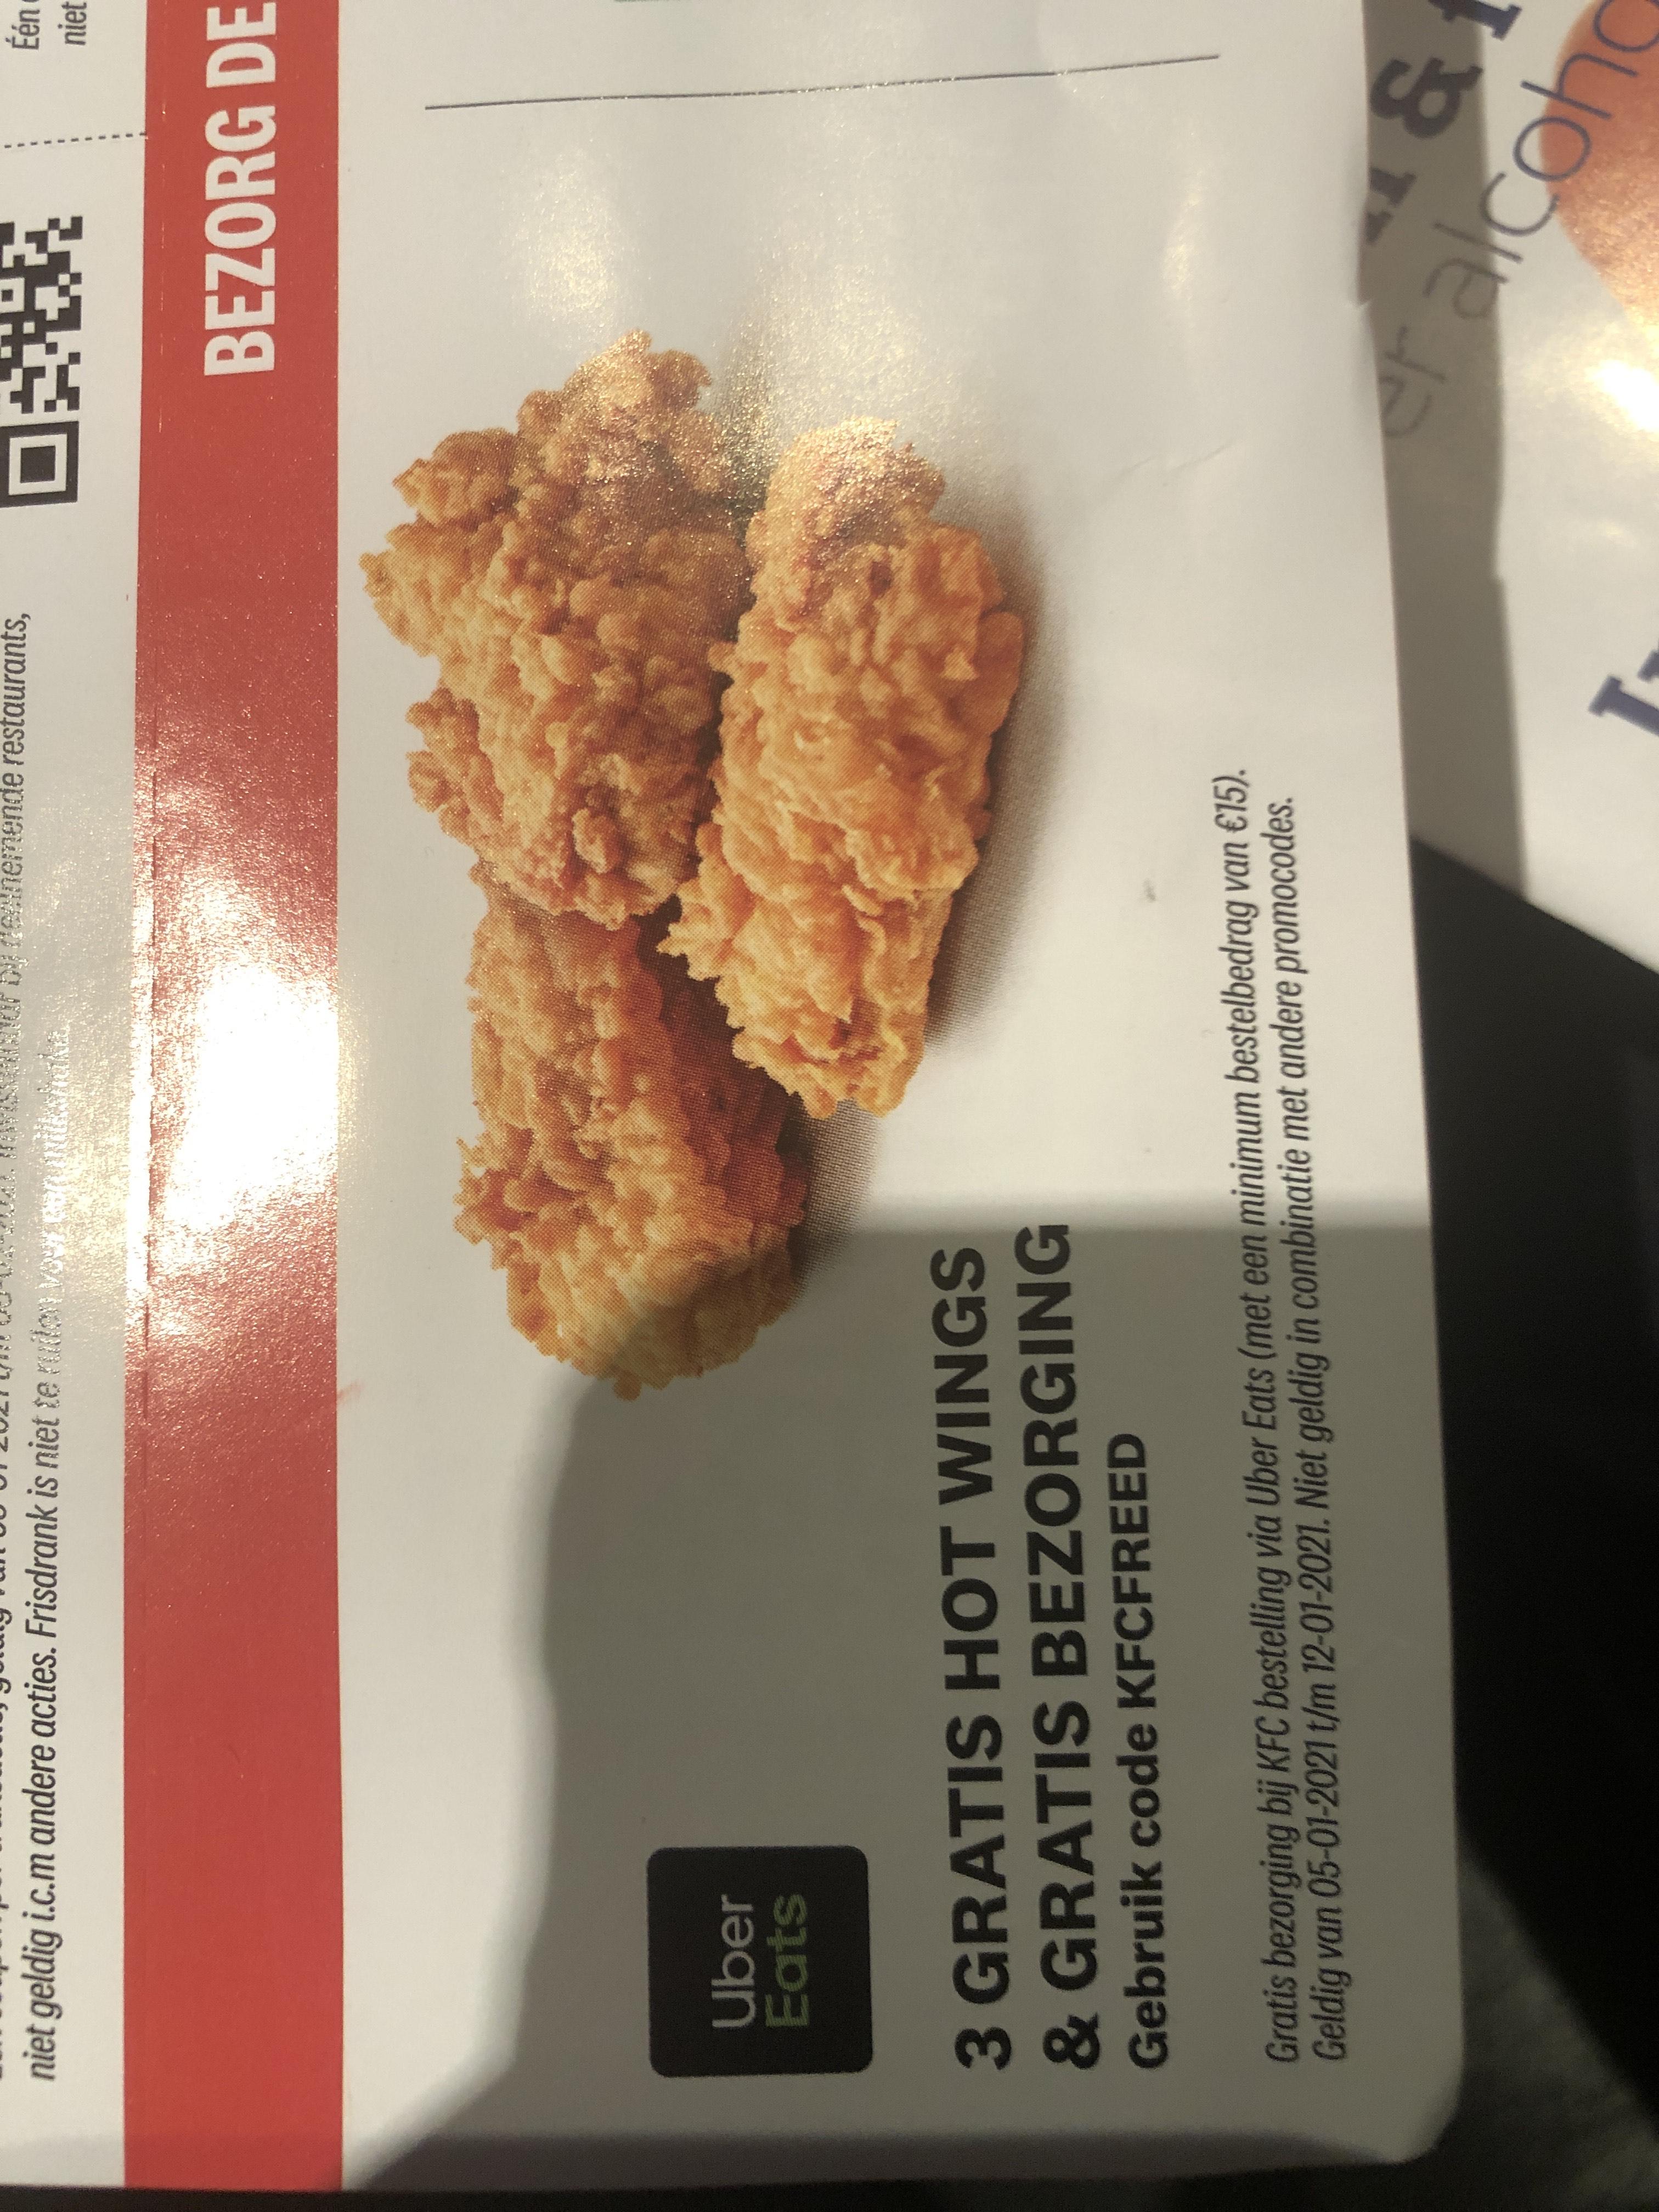 UberEats KFC Coupon (3 Gratis Hot Wings + bezorging) minimale besteding €15